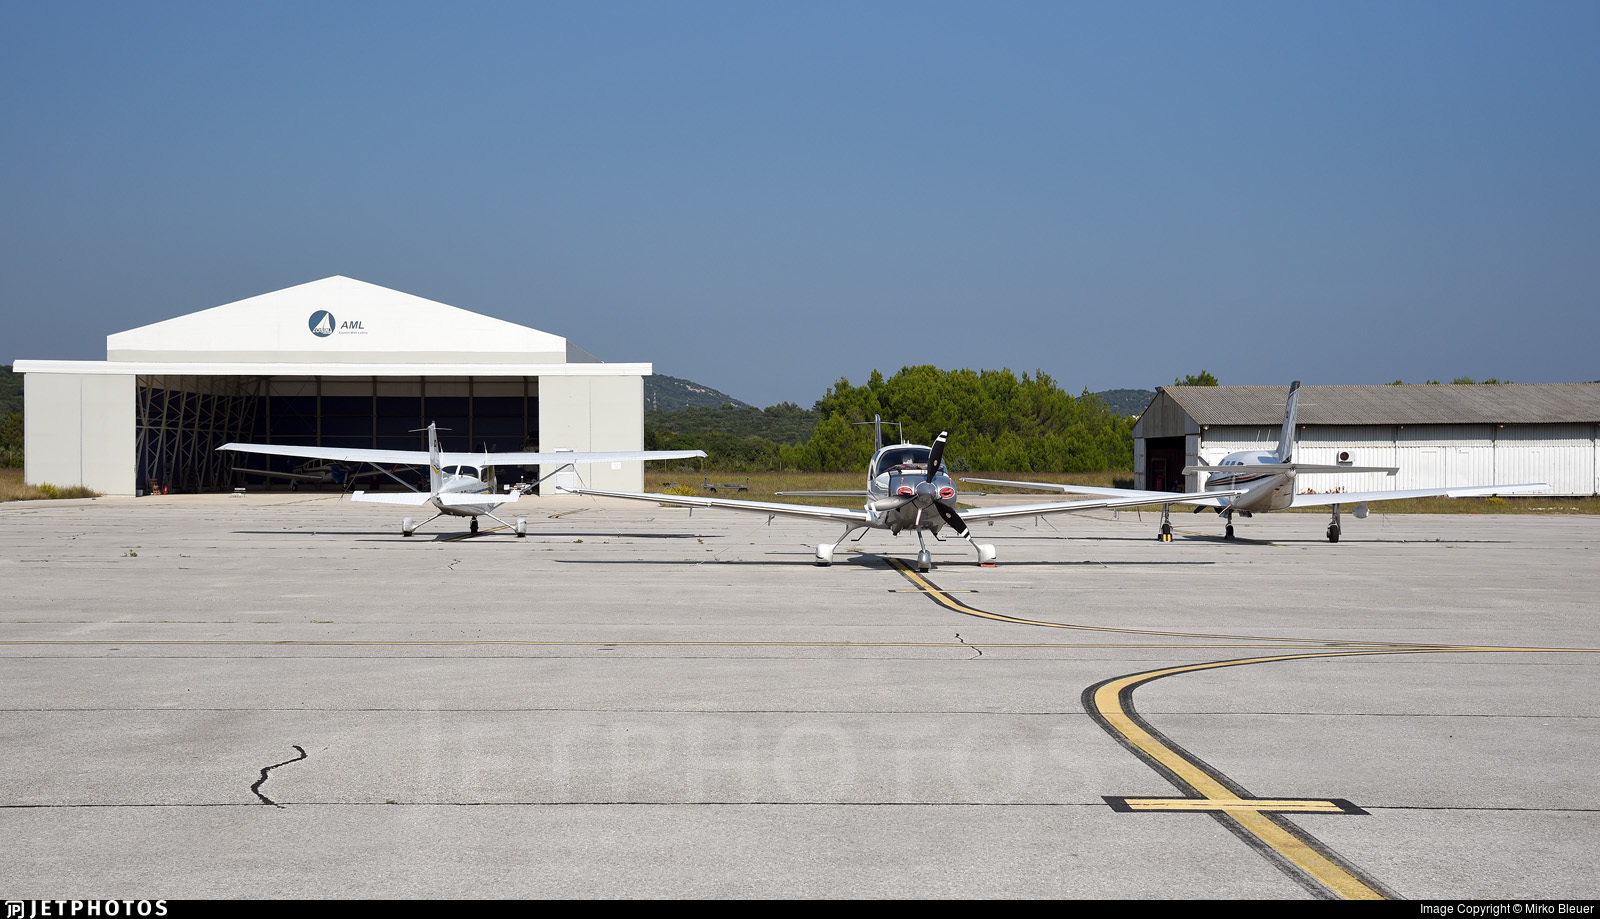 LDLO - Airport - Ramp